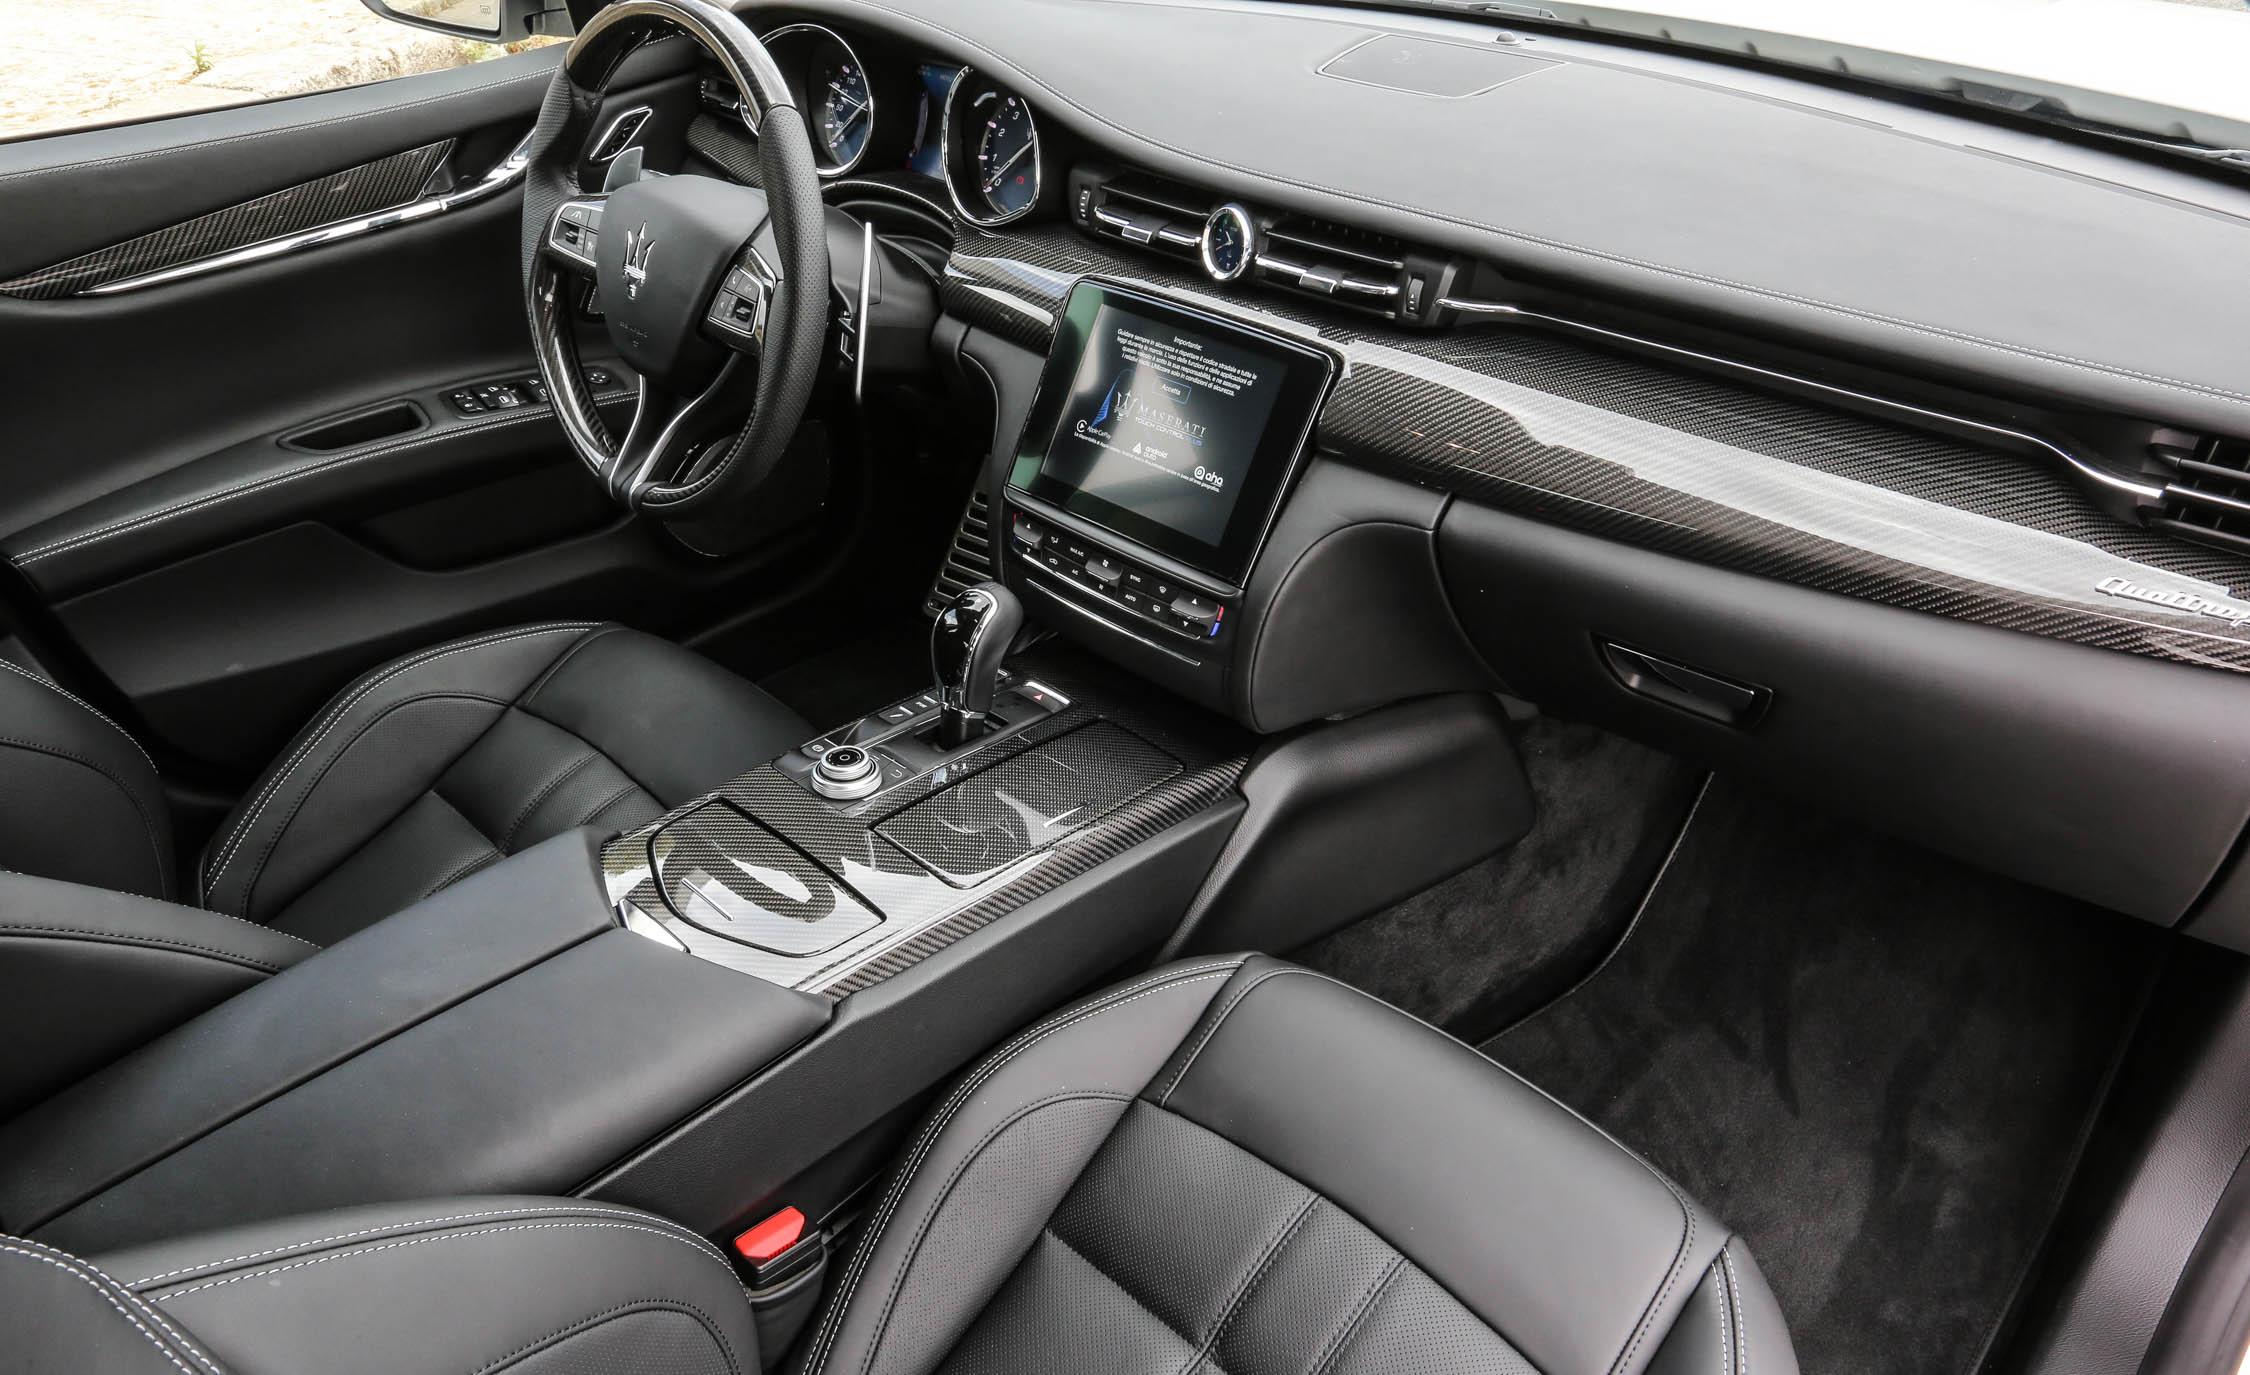 2017 Maserati Quattroporte GTS GranSport (View 36 of 55)